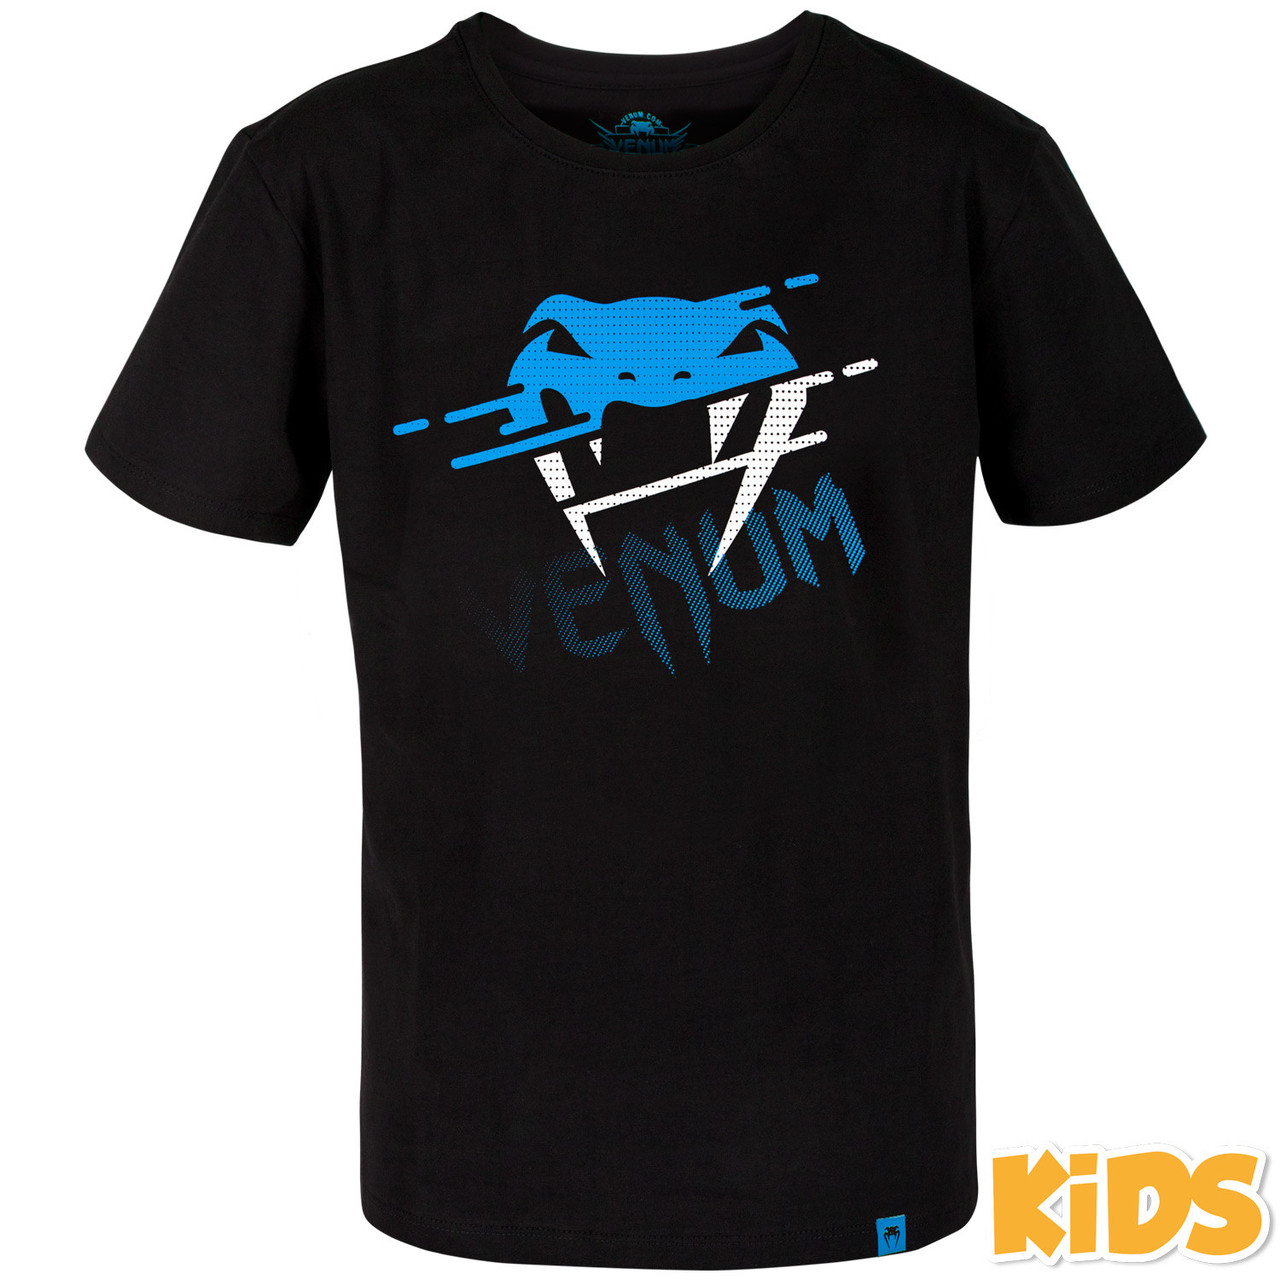 Футболка детская Venum Tornado Kids 10